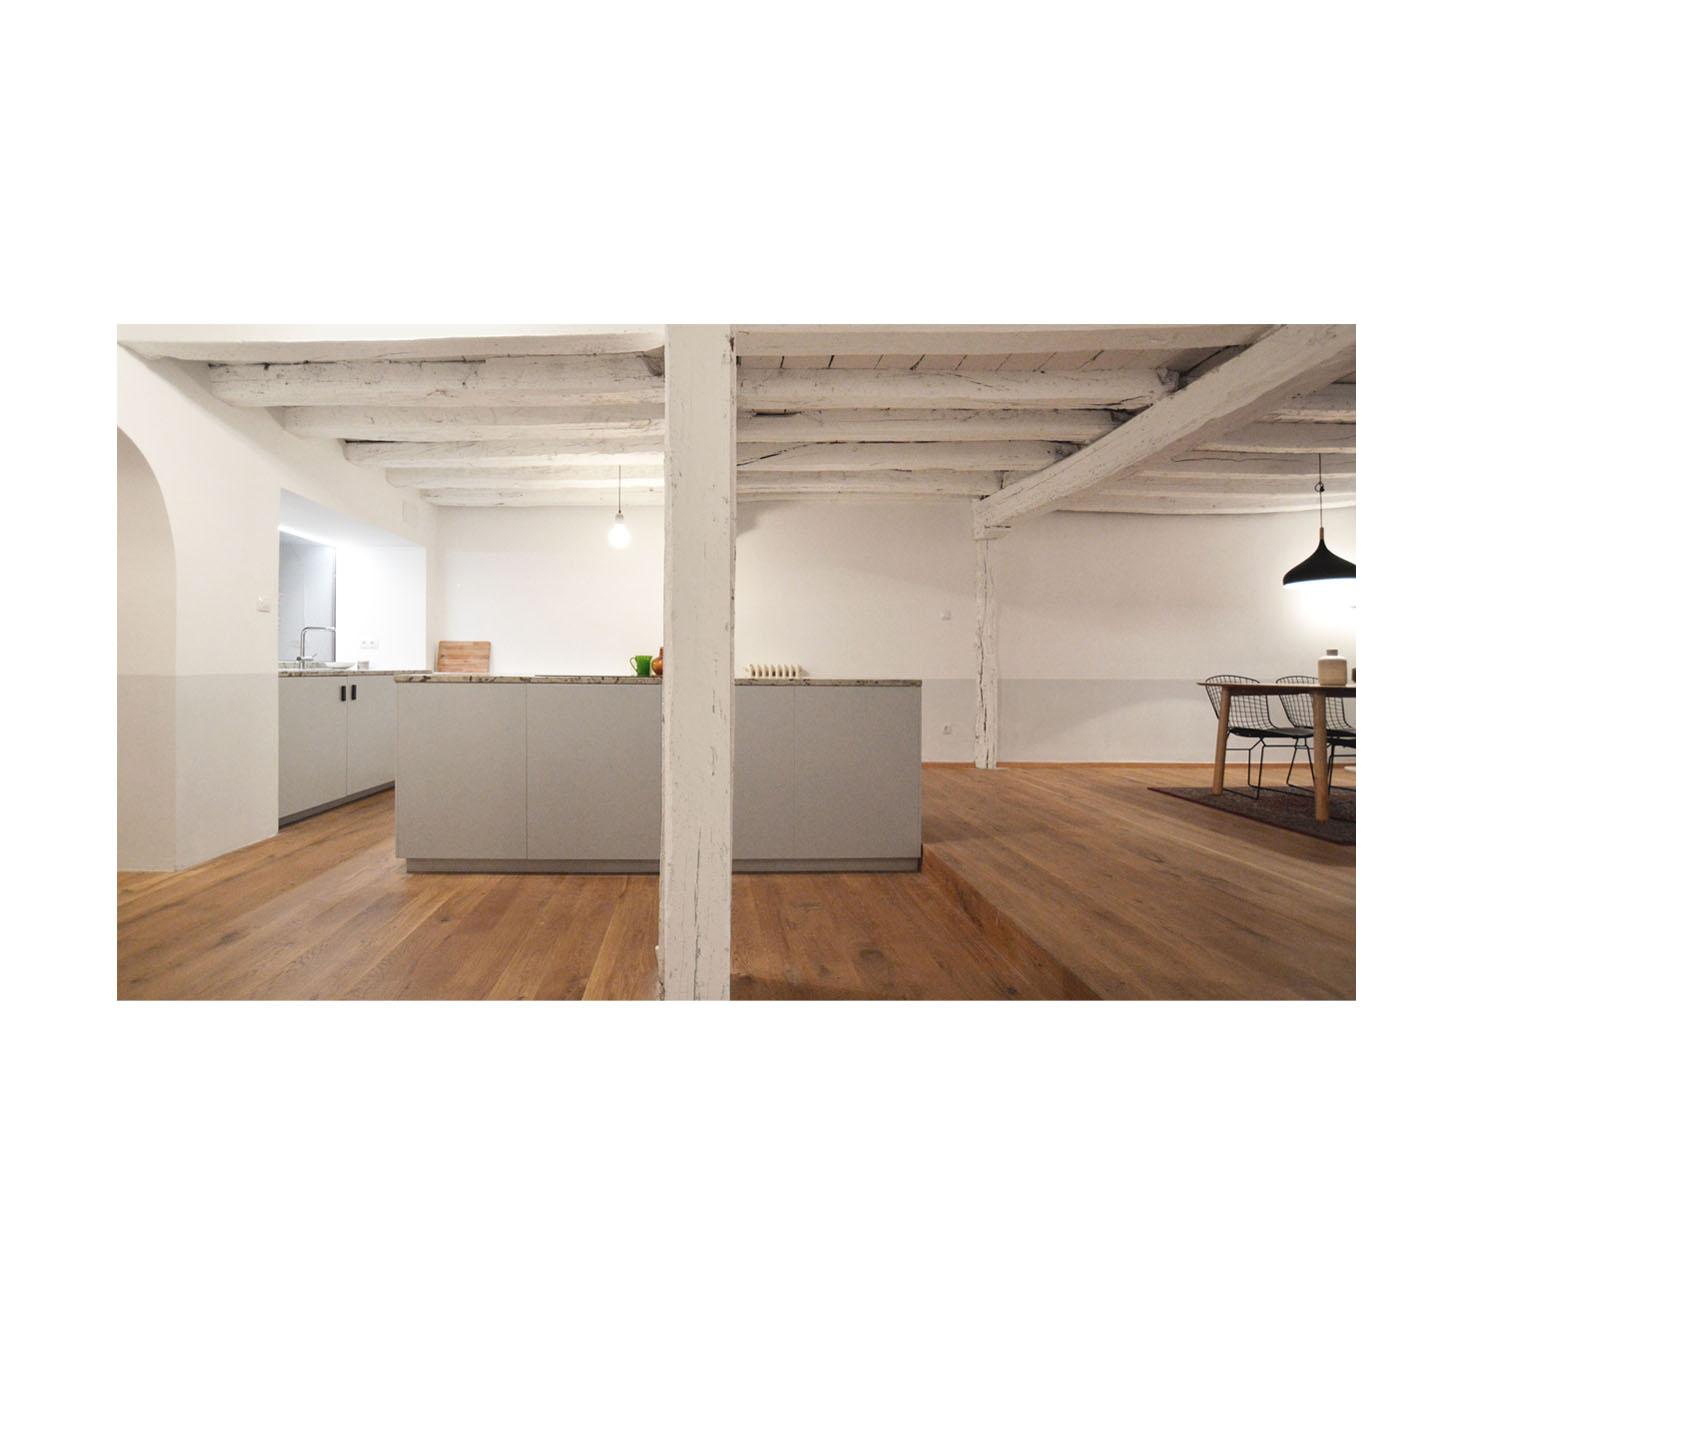 Apartment Artekale-Bilbao-Image 01.jpg